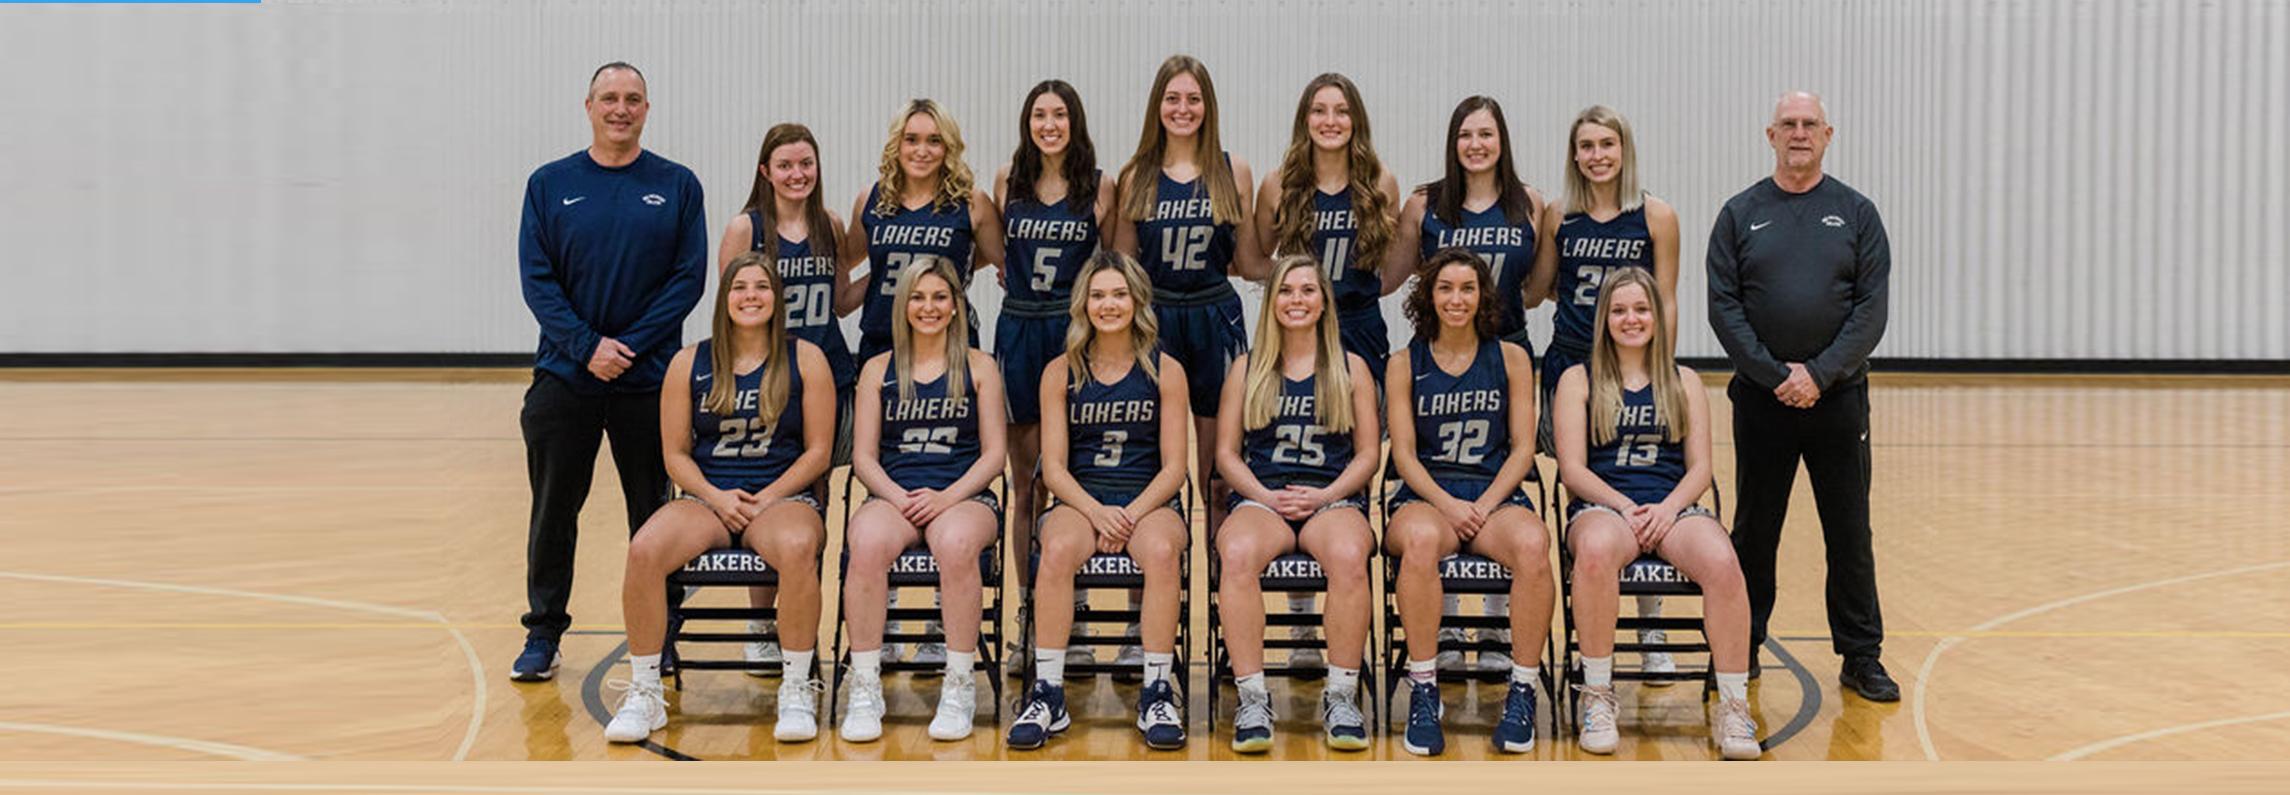 Women's Basketball team photo 2018-19